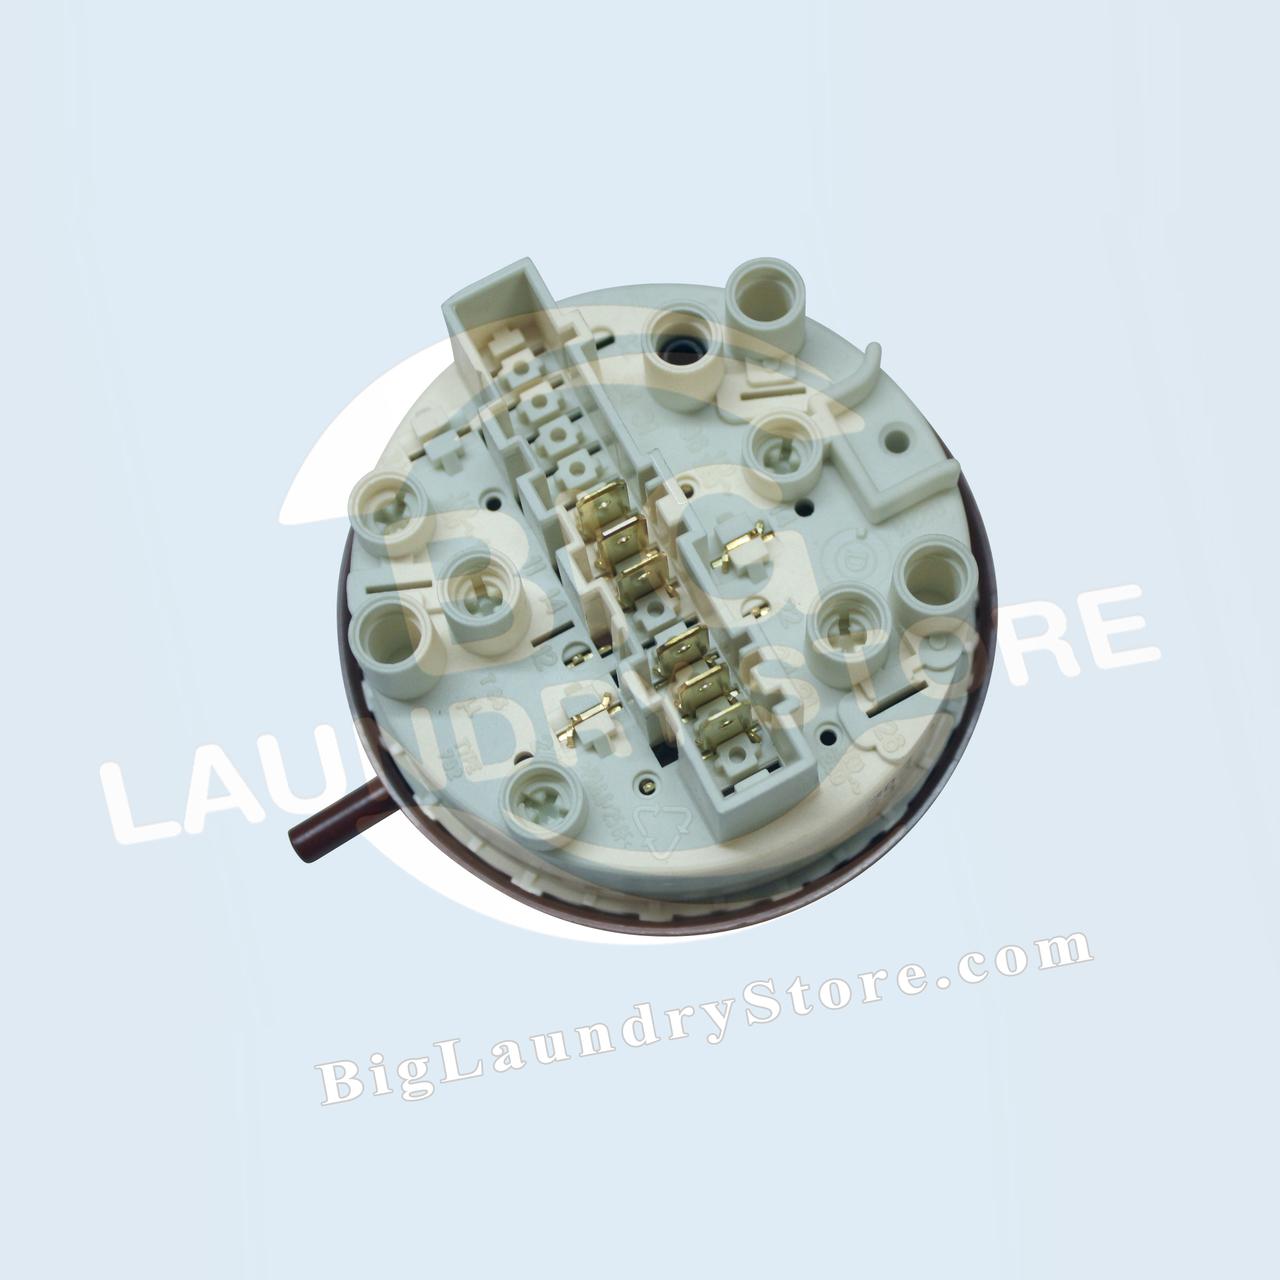 Level Control Switch - W75 - Wascomat # 885901